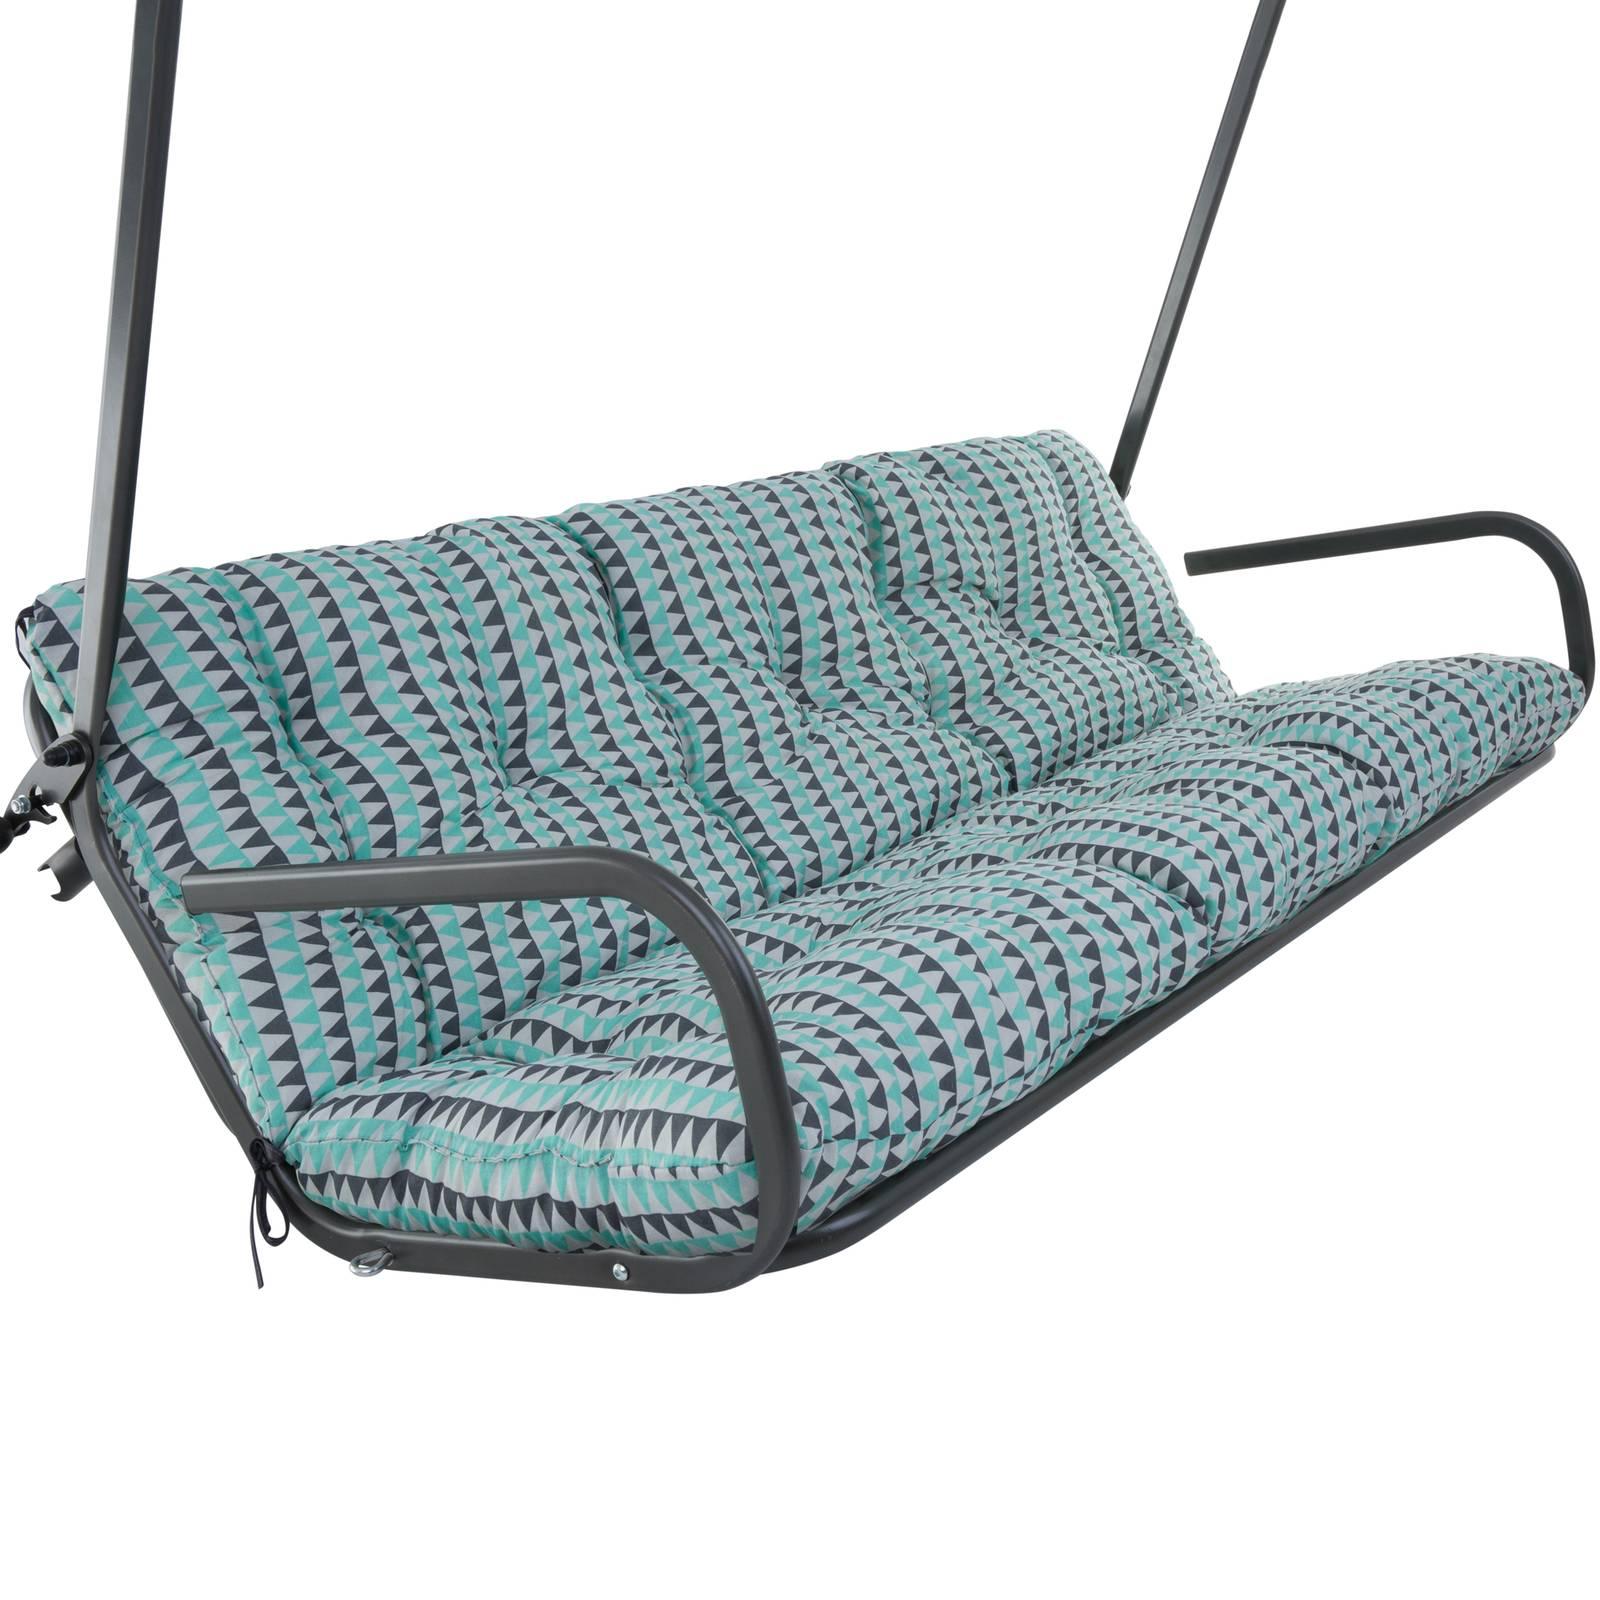 Sedák v kuse na houpačku / lavici Frigiliana H026-06PB PATIO